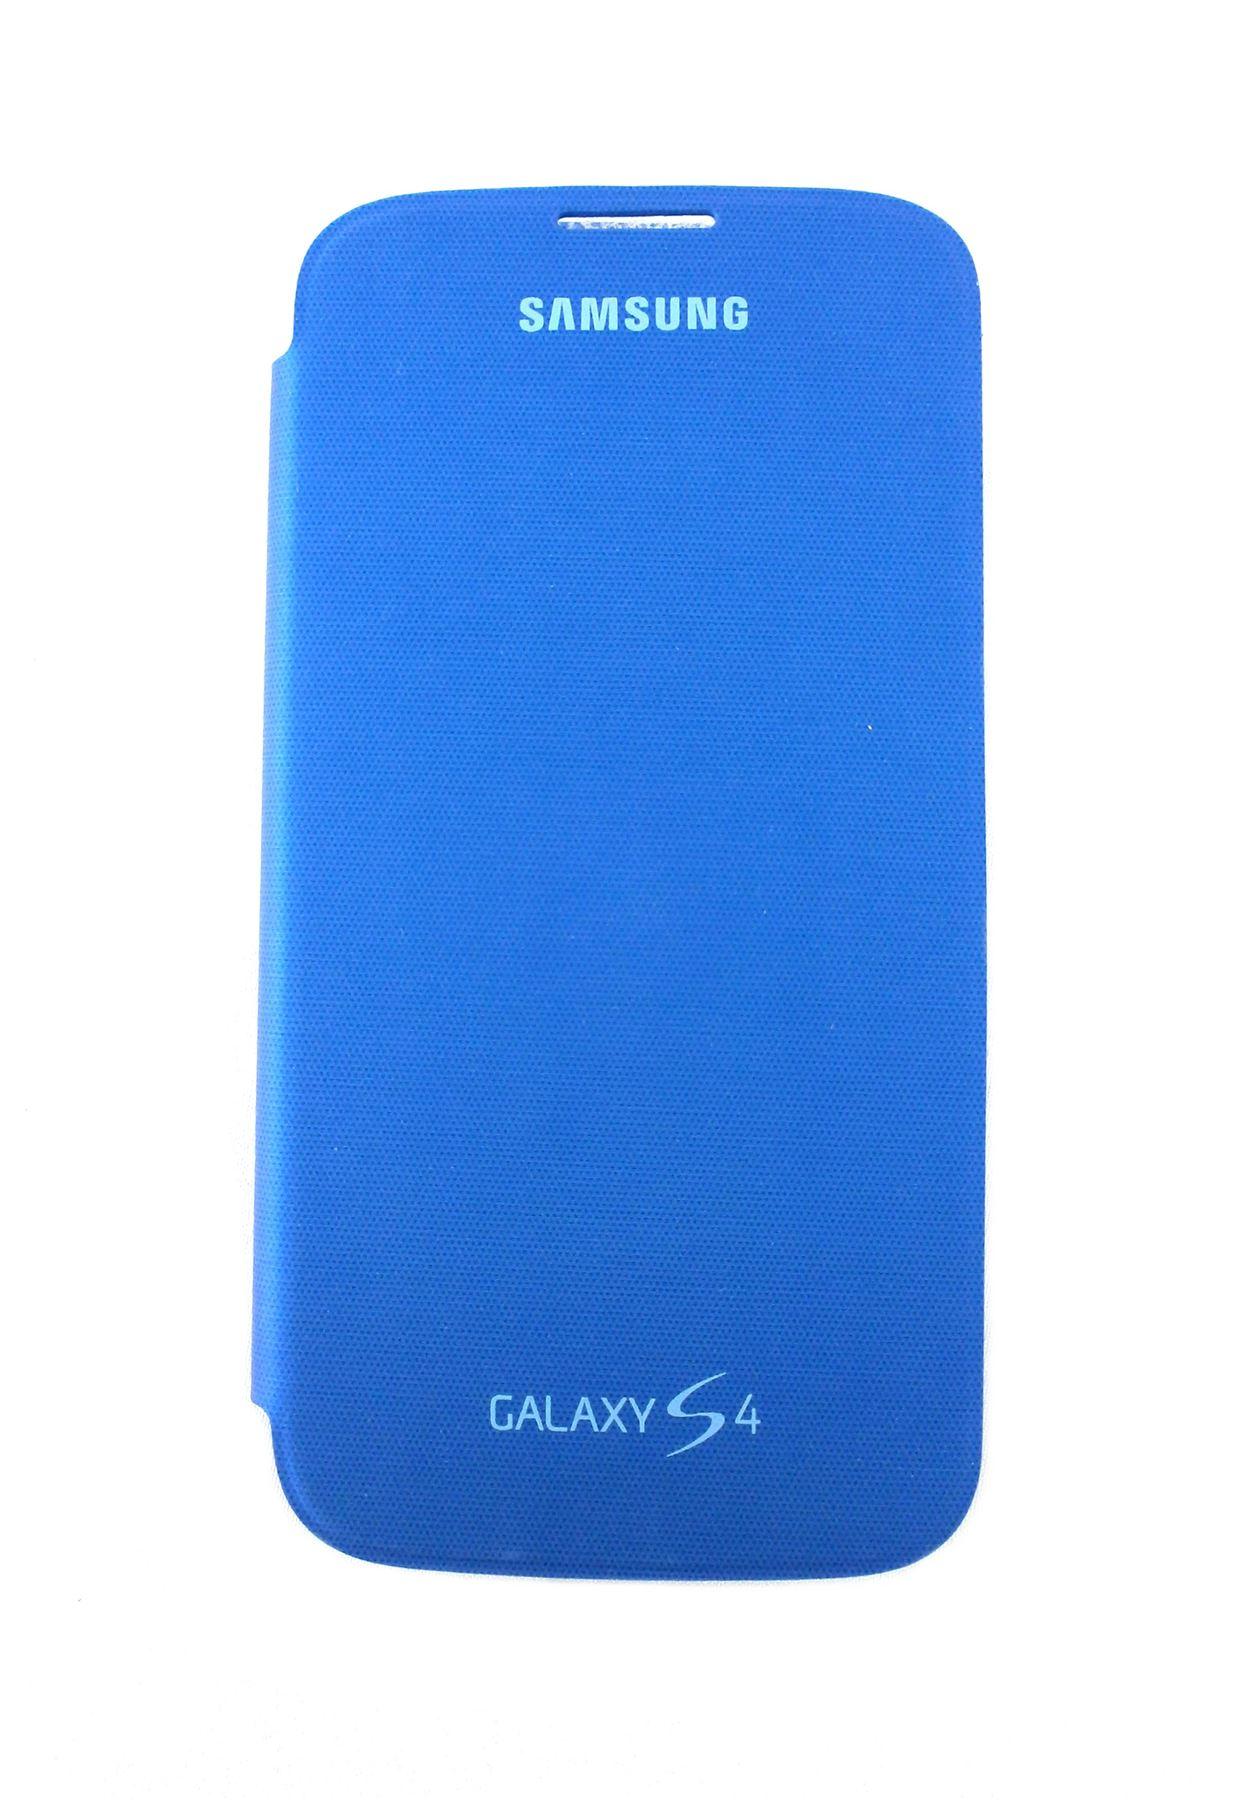 samsung galaxy s4 case blue